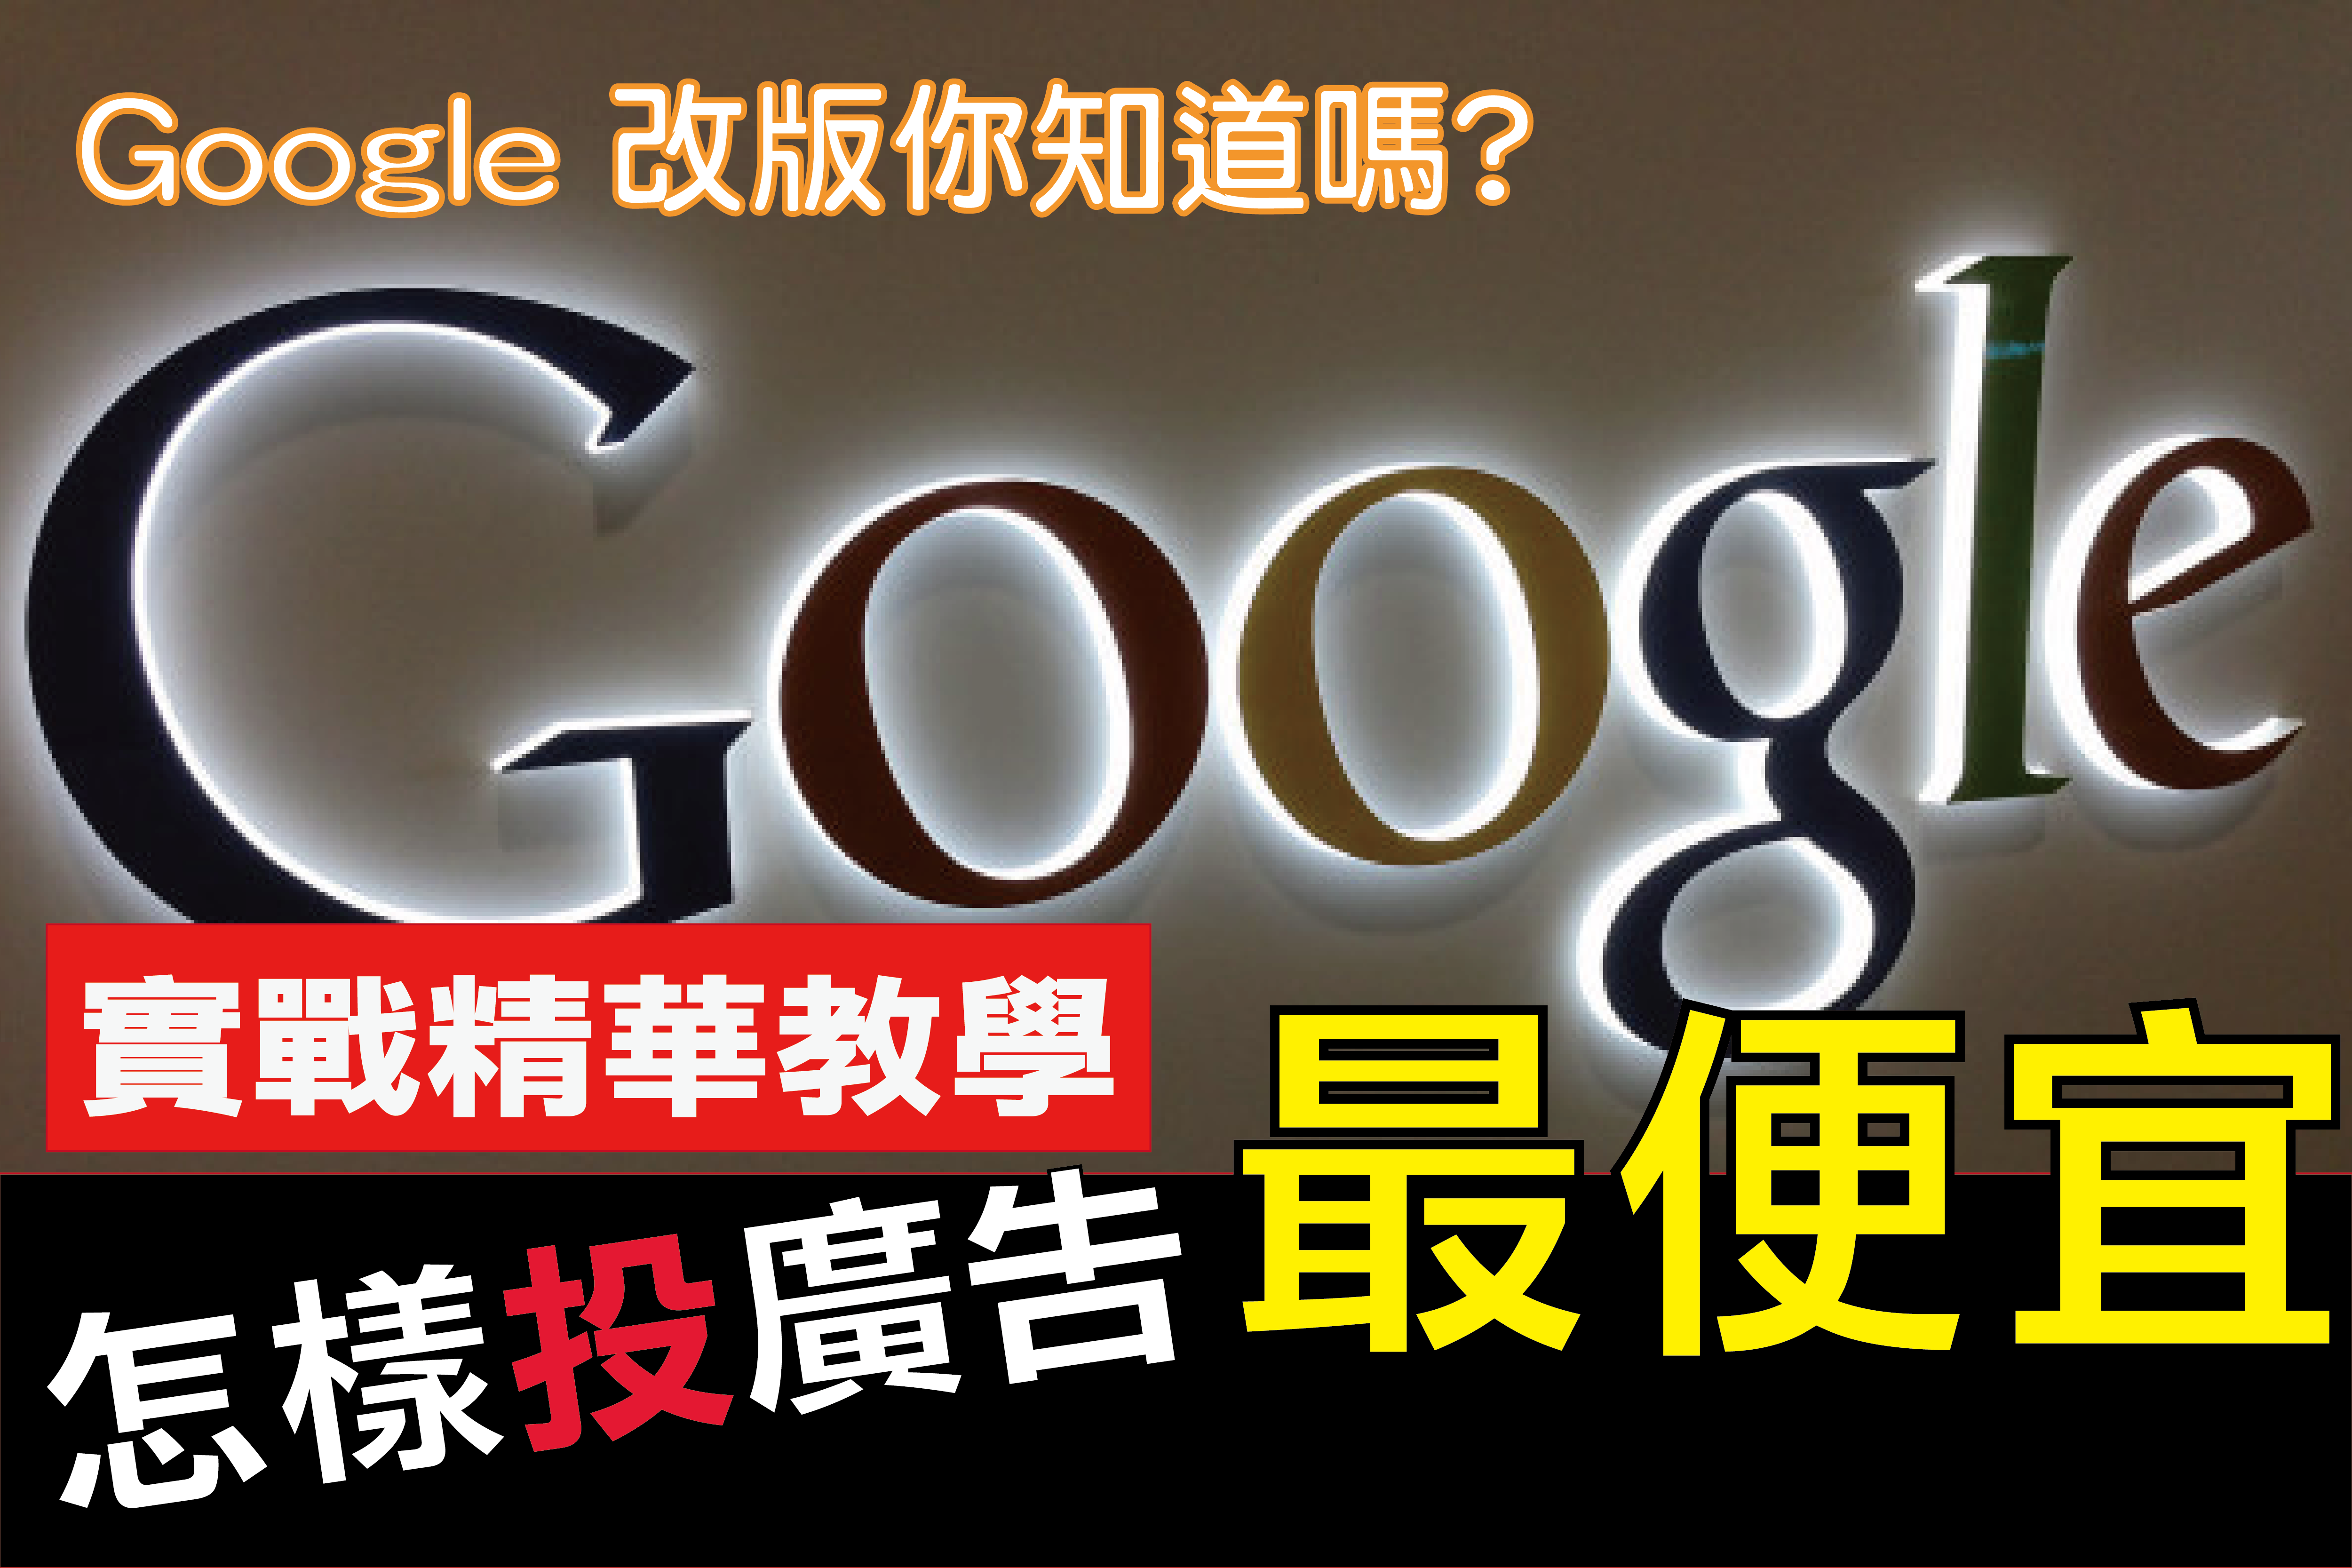 Google關鍵字廣告|這樣投廣告,最便宜! 4步驟速成!實戰精華懶人包 (新版Google Ads)